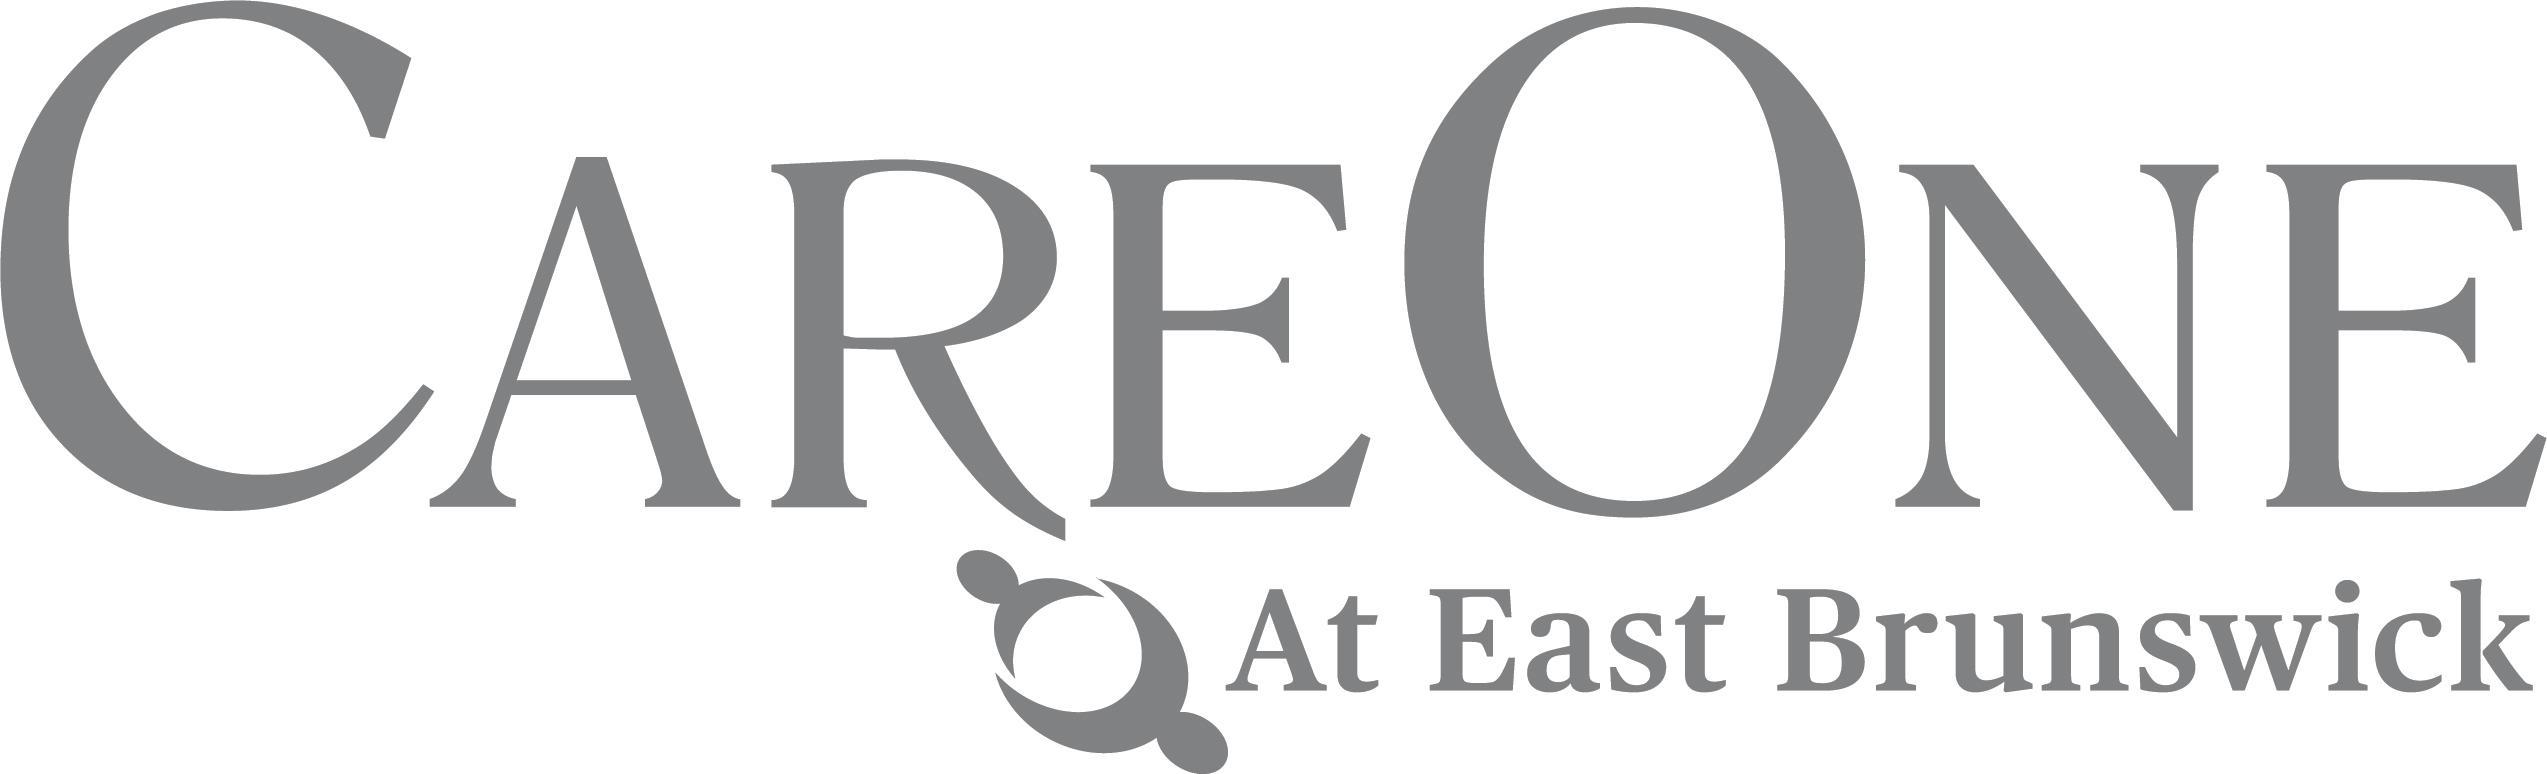 CareOne at East Brunswick - East Brunswick, NJ 08816 - (732)967-0100   ShowMeLocal.com